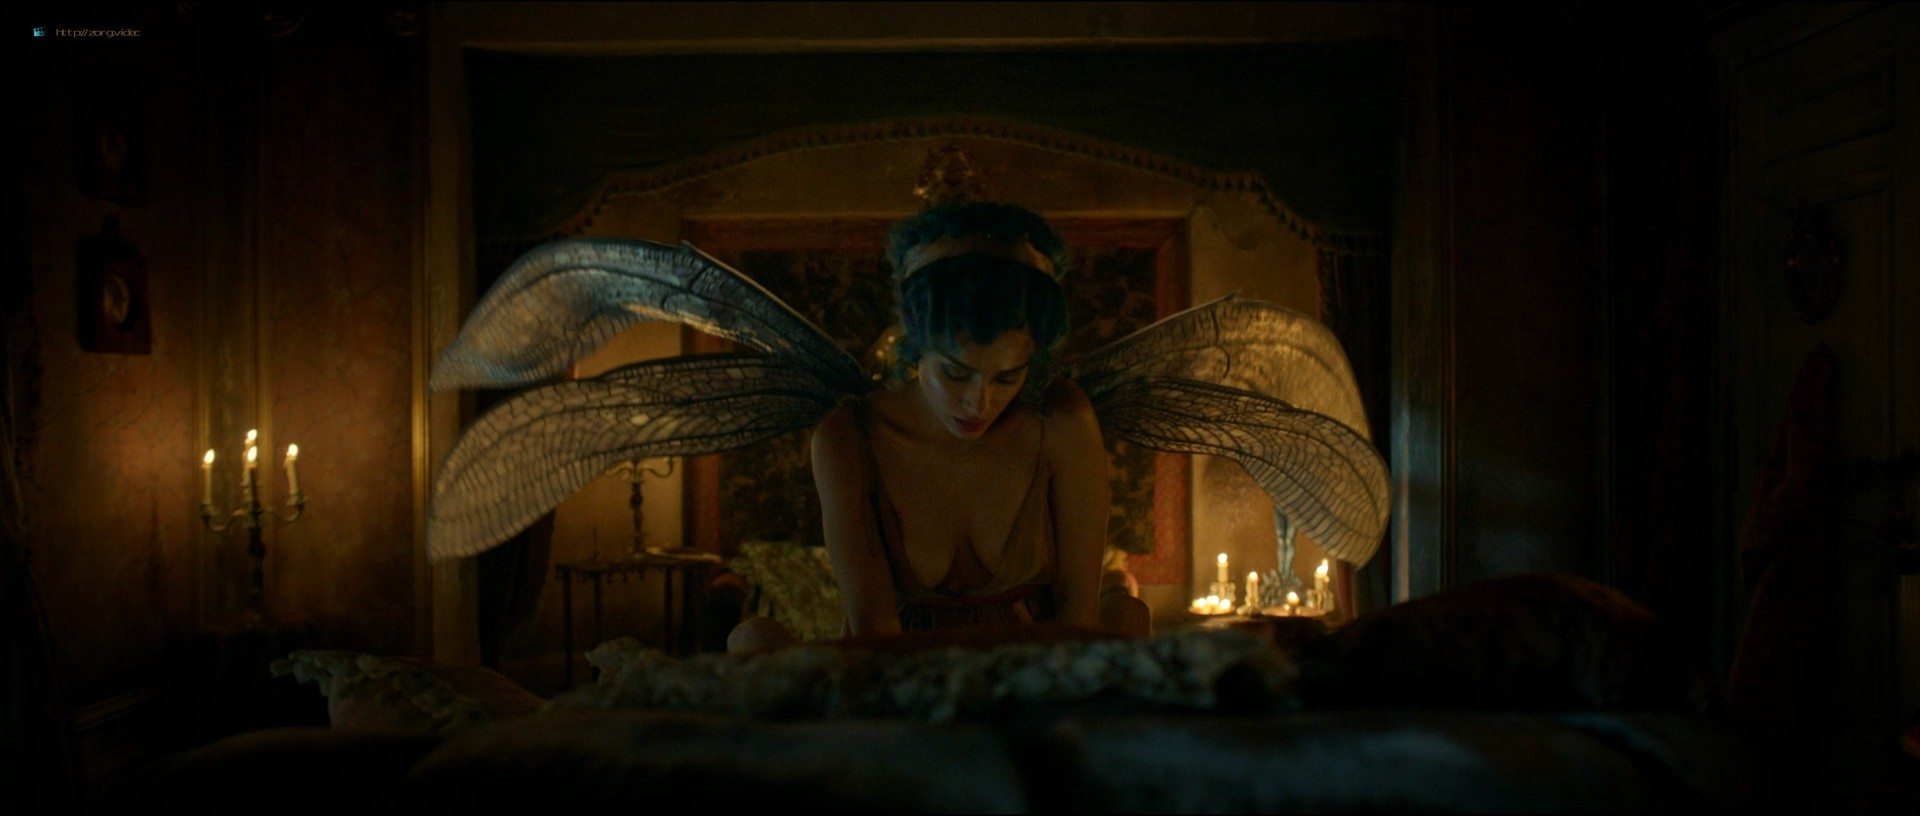 Maeve Dermody nude sex Karla Crome nude too - Carnival Row (2019) s1e1 HD 1080p (7)